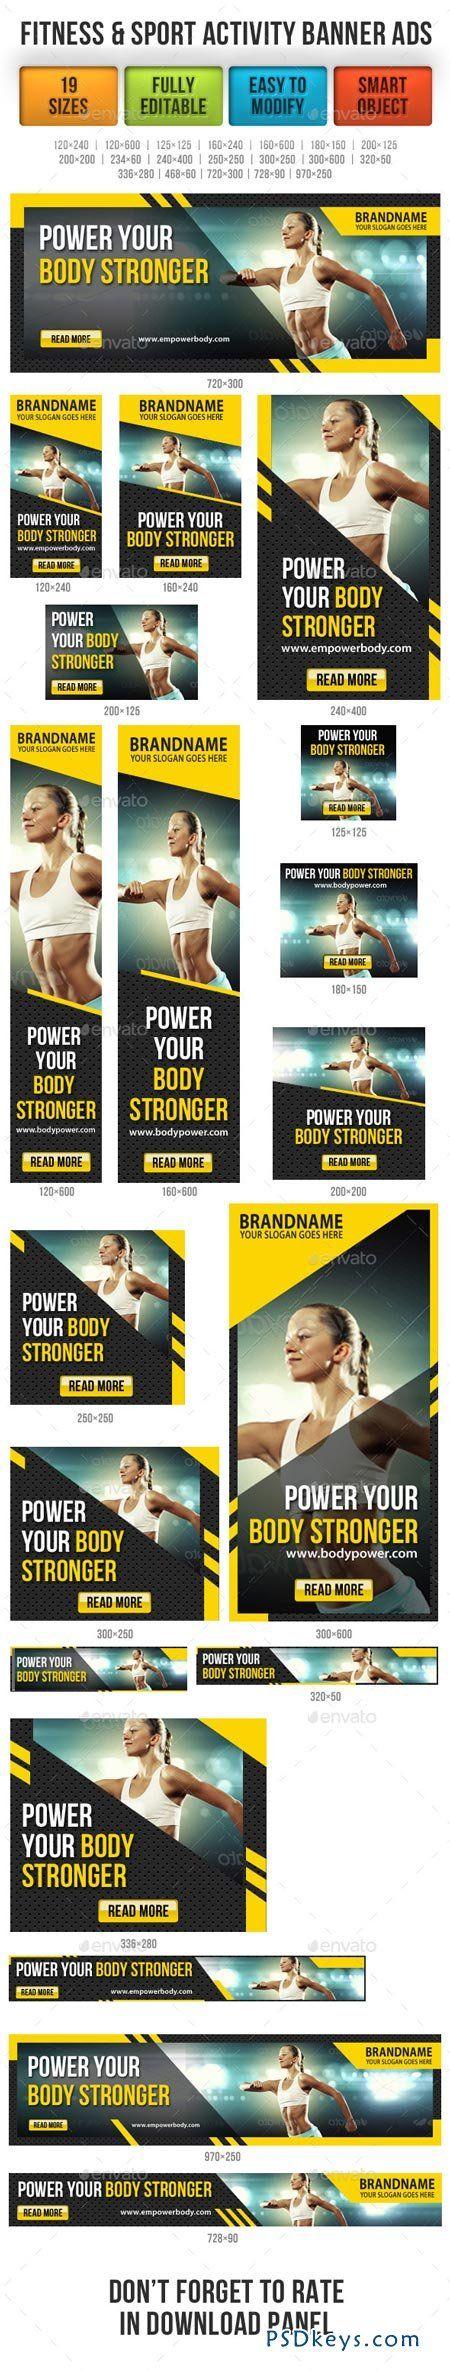 Fitness & Sport Activity Banner Ads 9120130